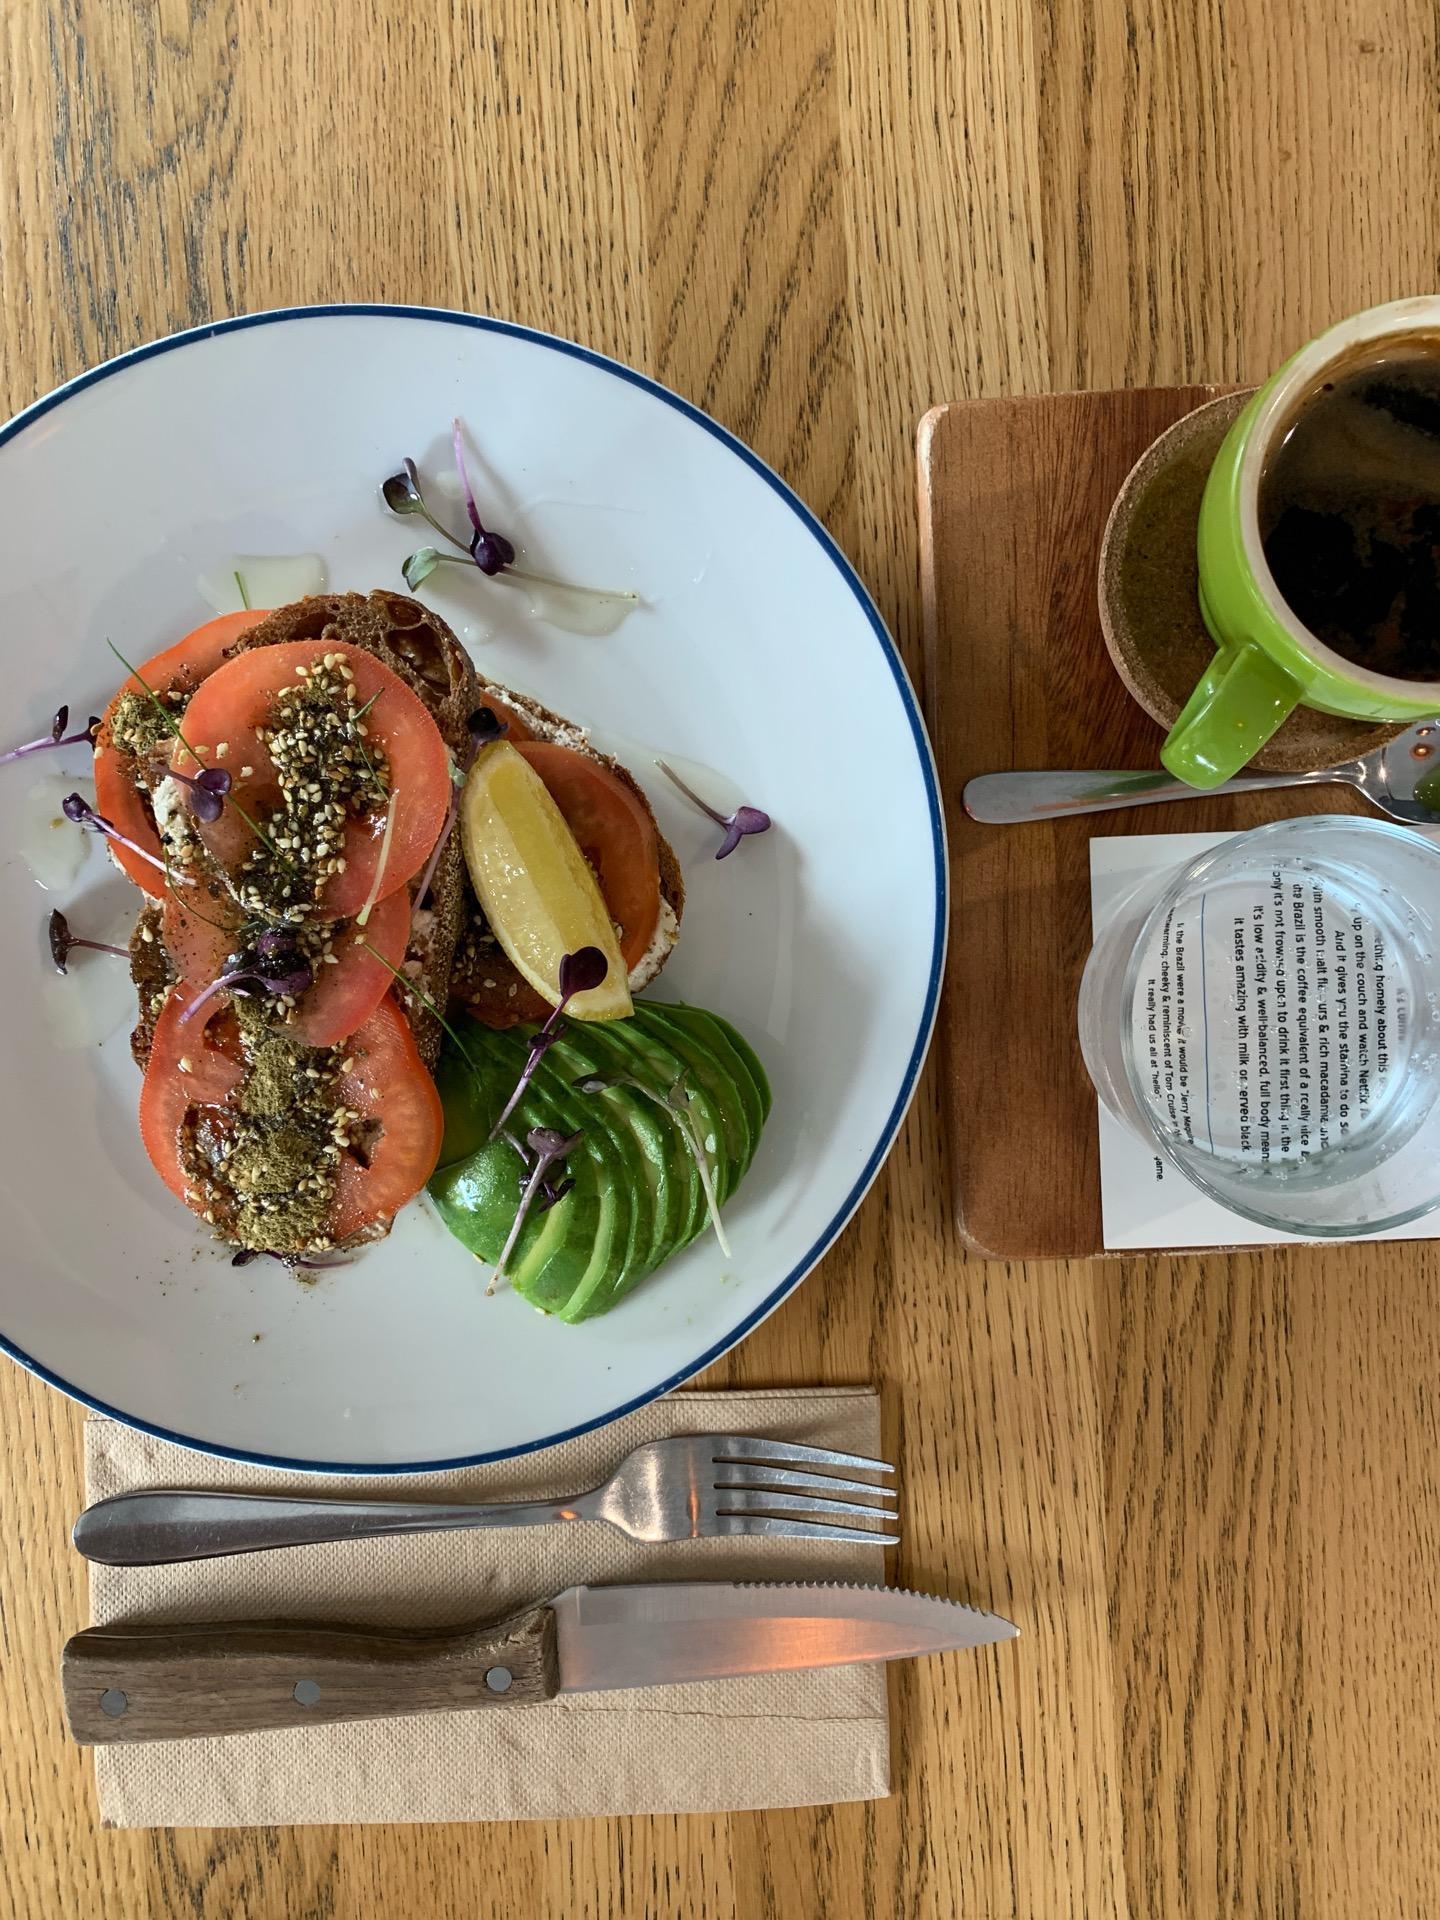 Mr O Kitchen Espresso | 41 Vincent Street, Cessnock, New South Wales 2325 | +61 2 4991 5368